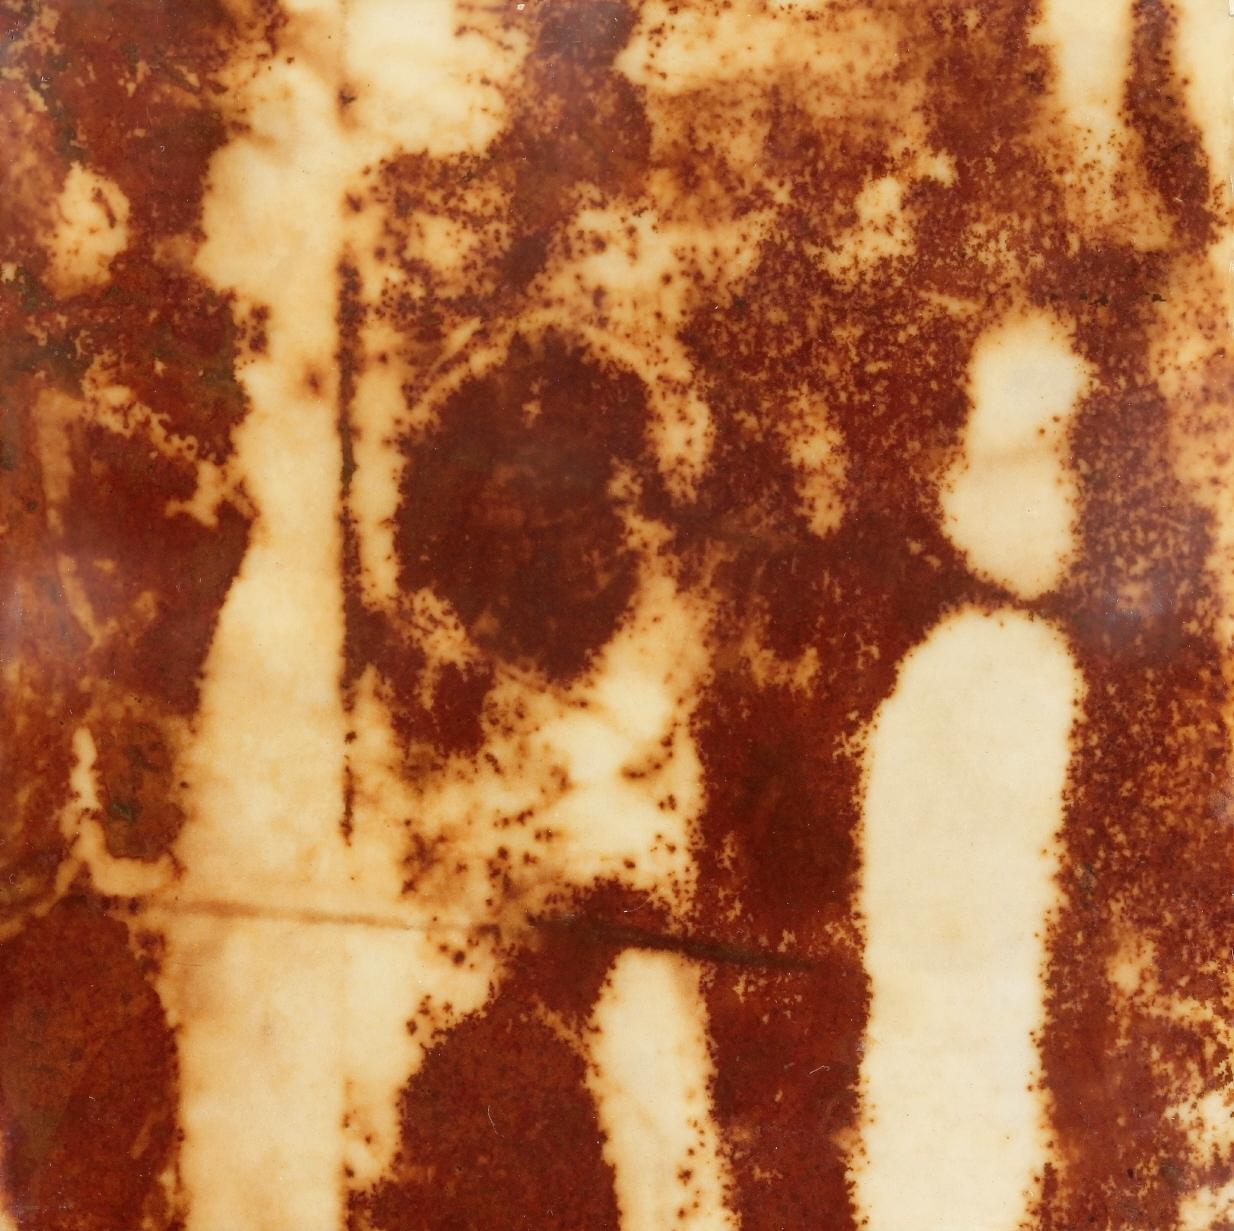 "Rust #11, 2013, Rust, encaustic on paper on panel, 6 x 6"""